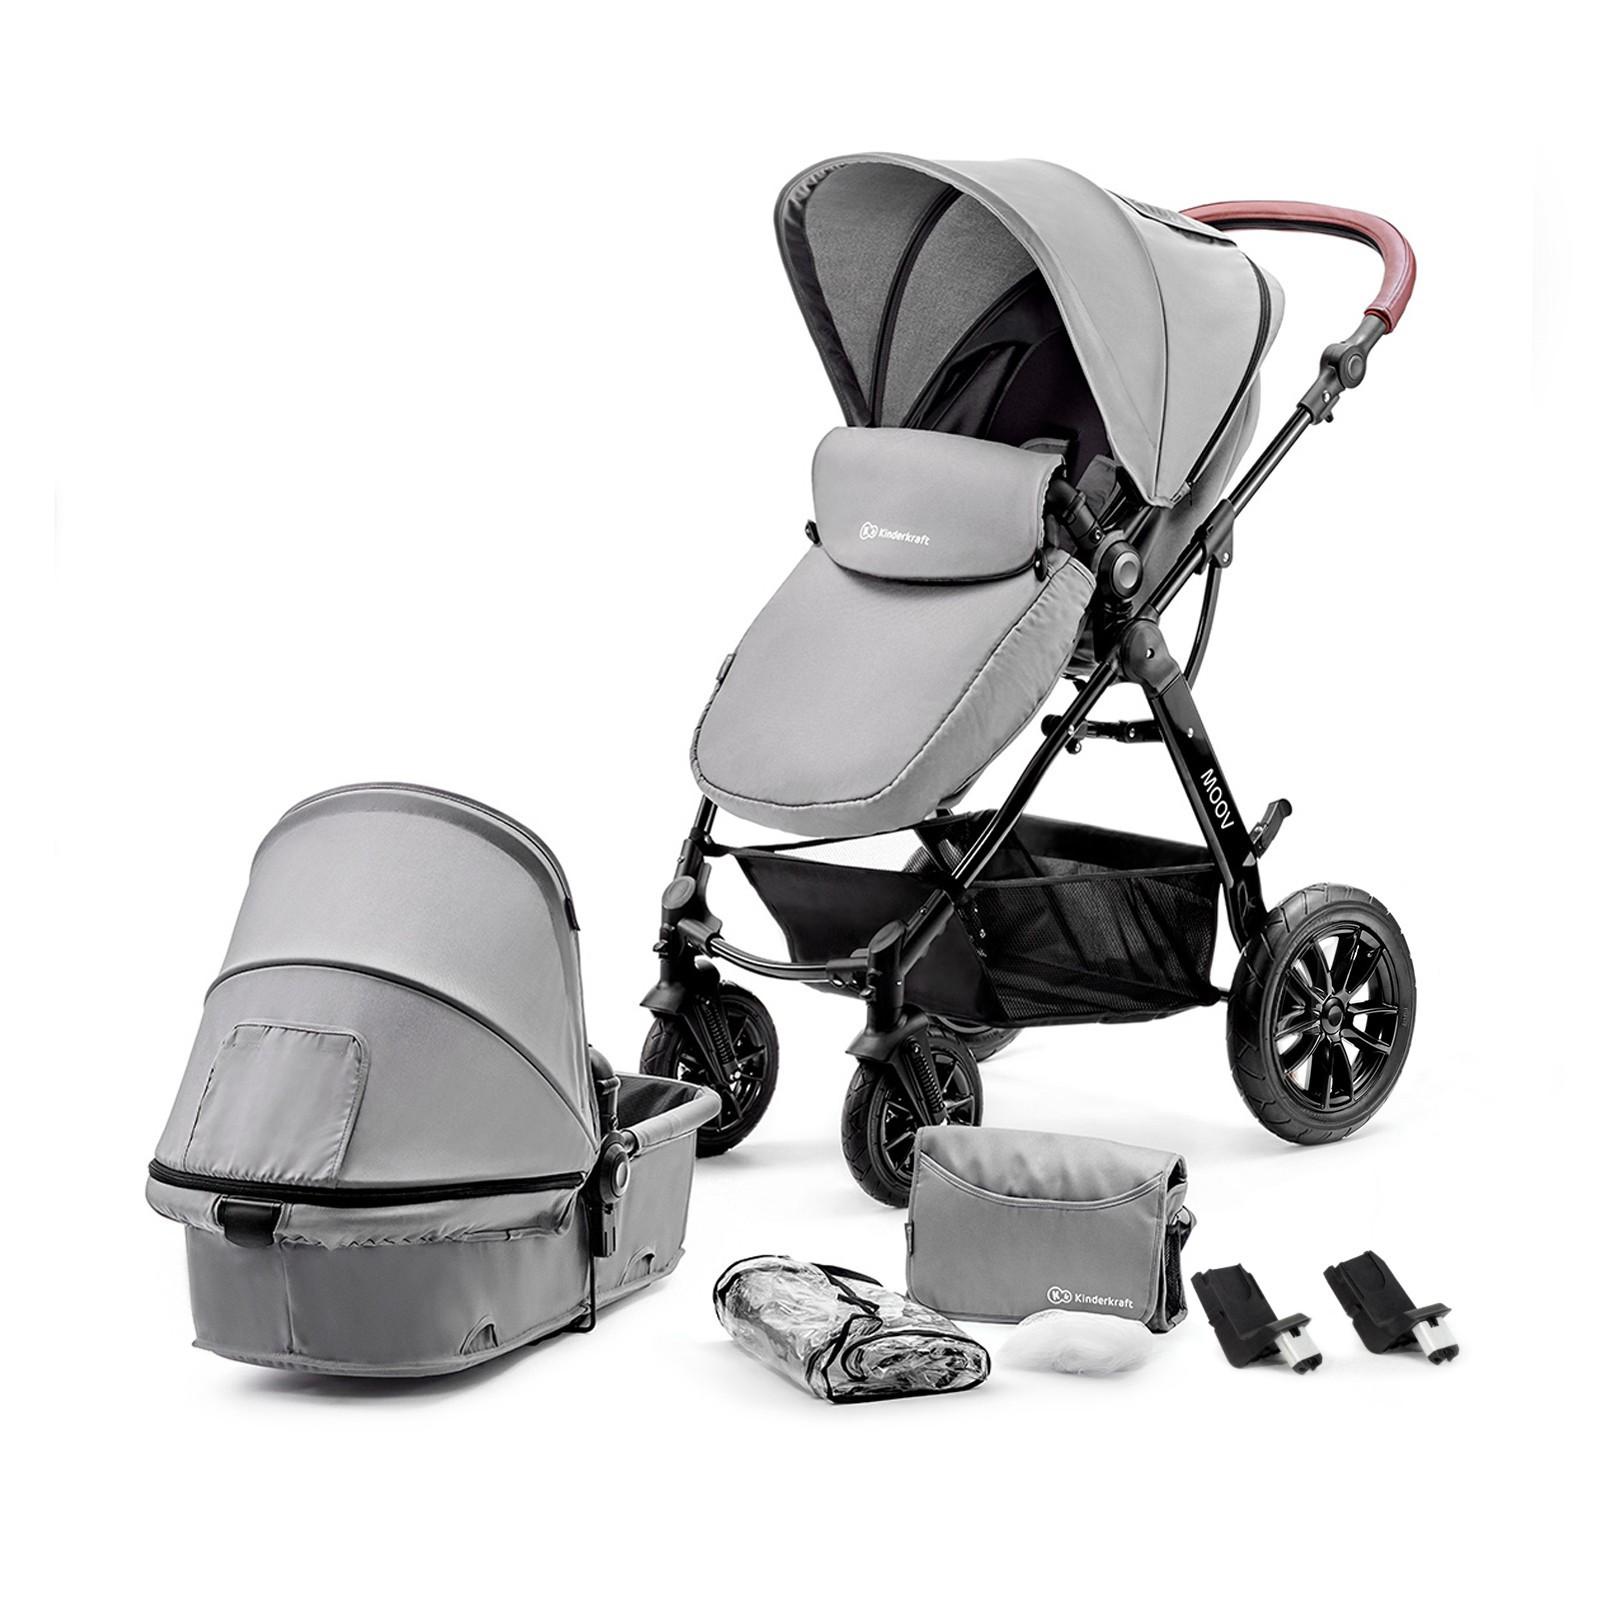 Kinderkraft Kinderwagen Moov 2 in 1 Grey